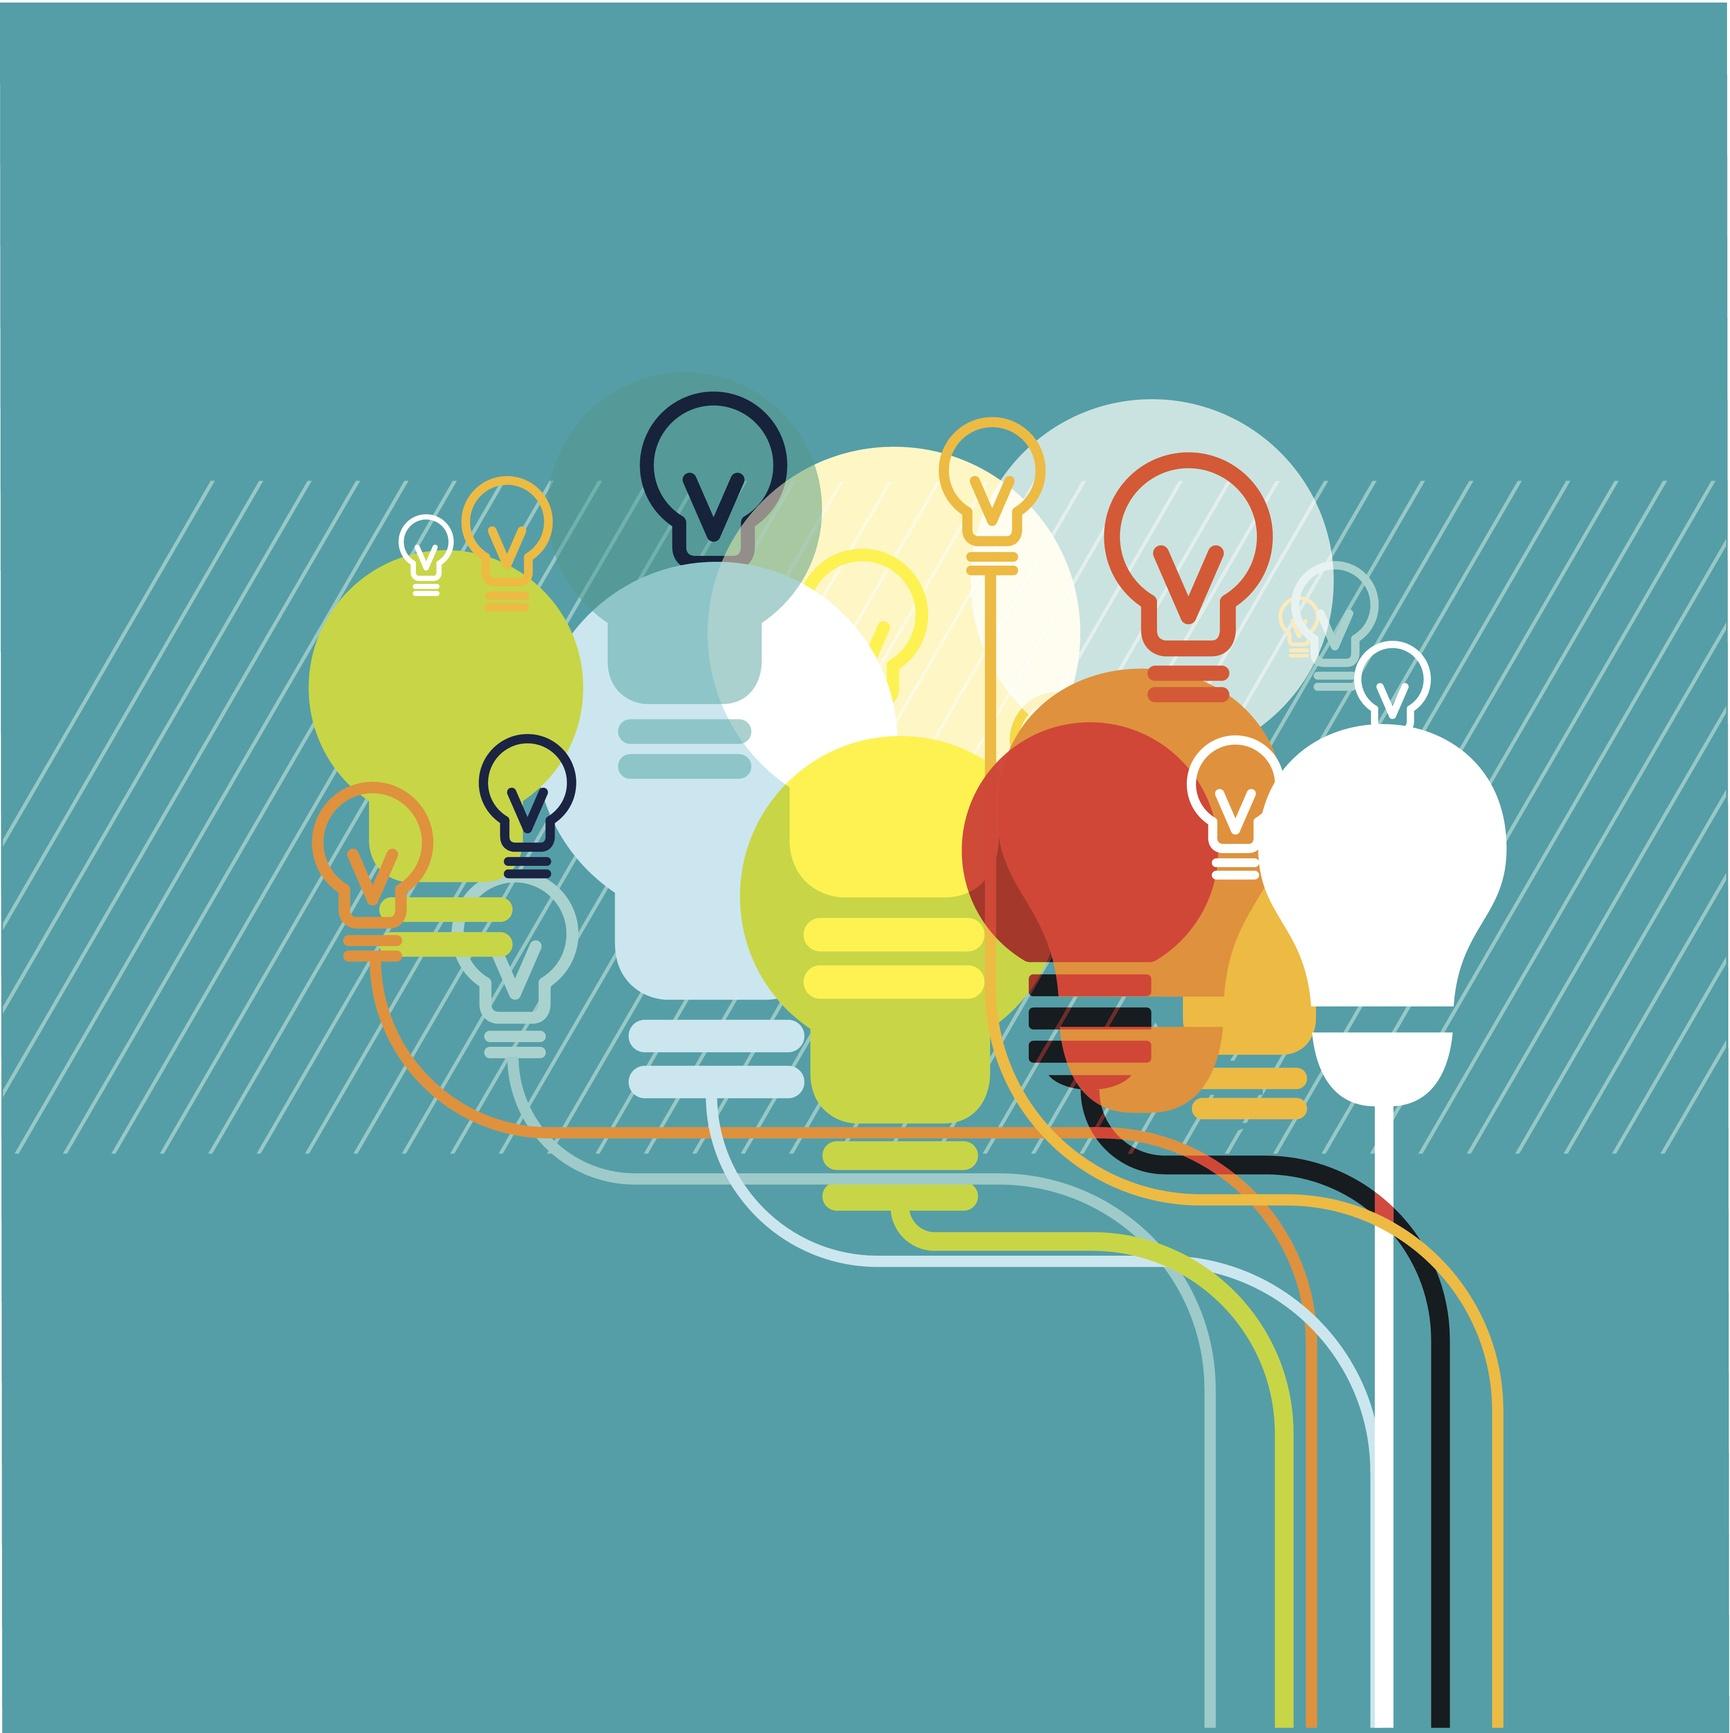 leveraging-ip-management-software-during-invention-disclosure.jpg